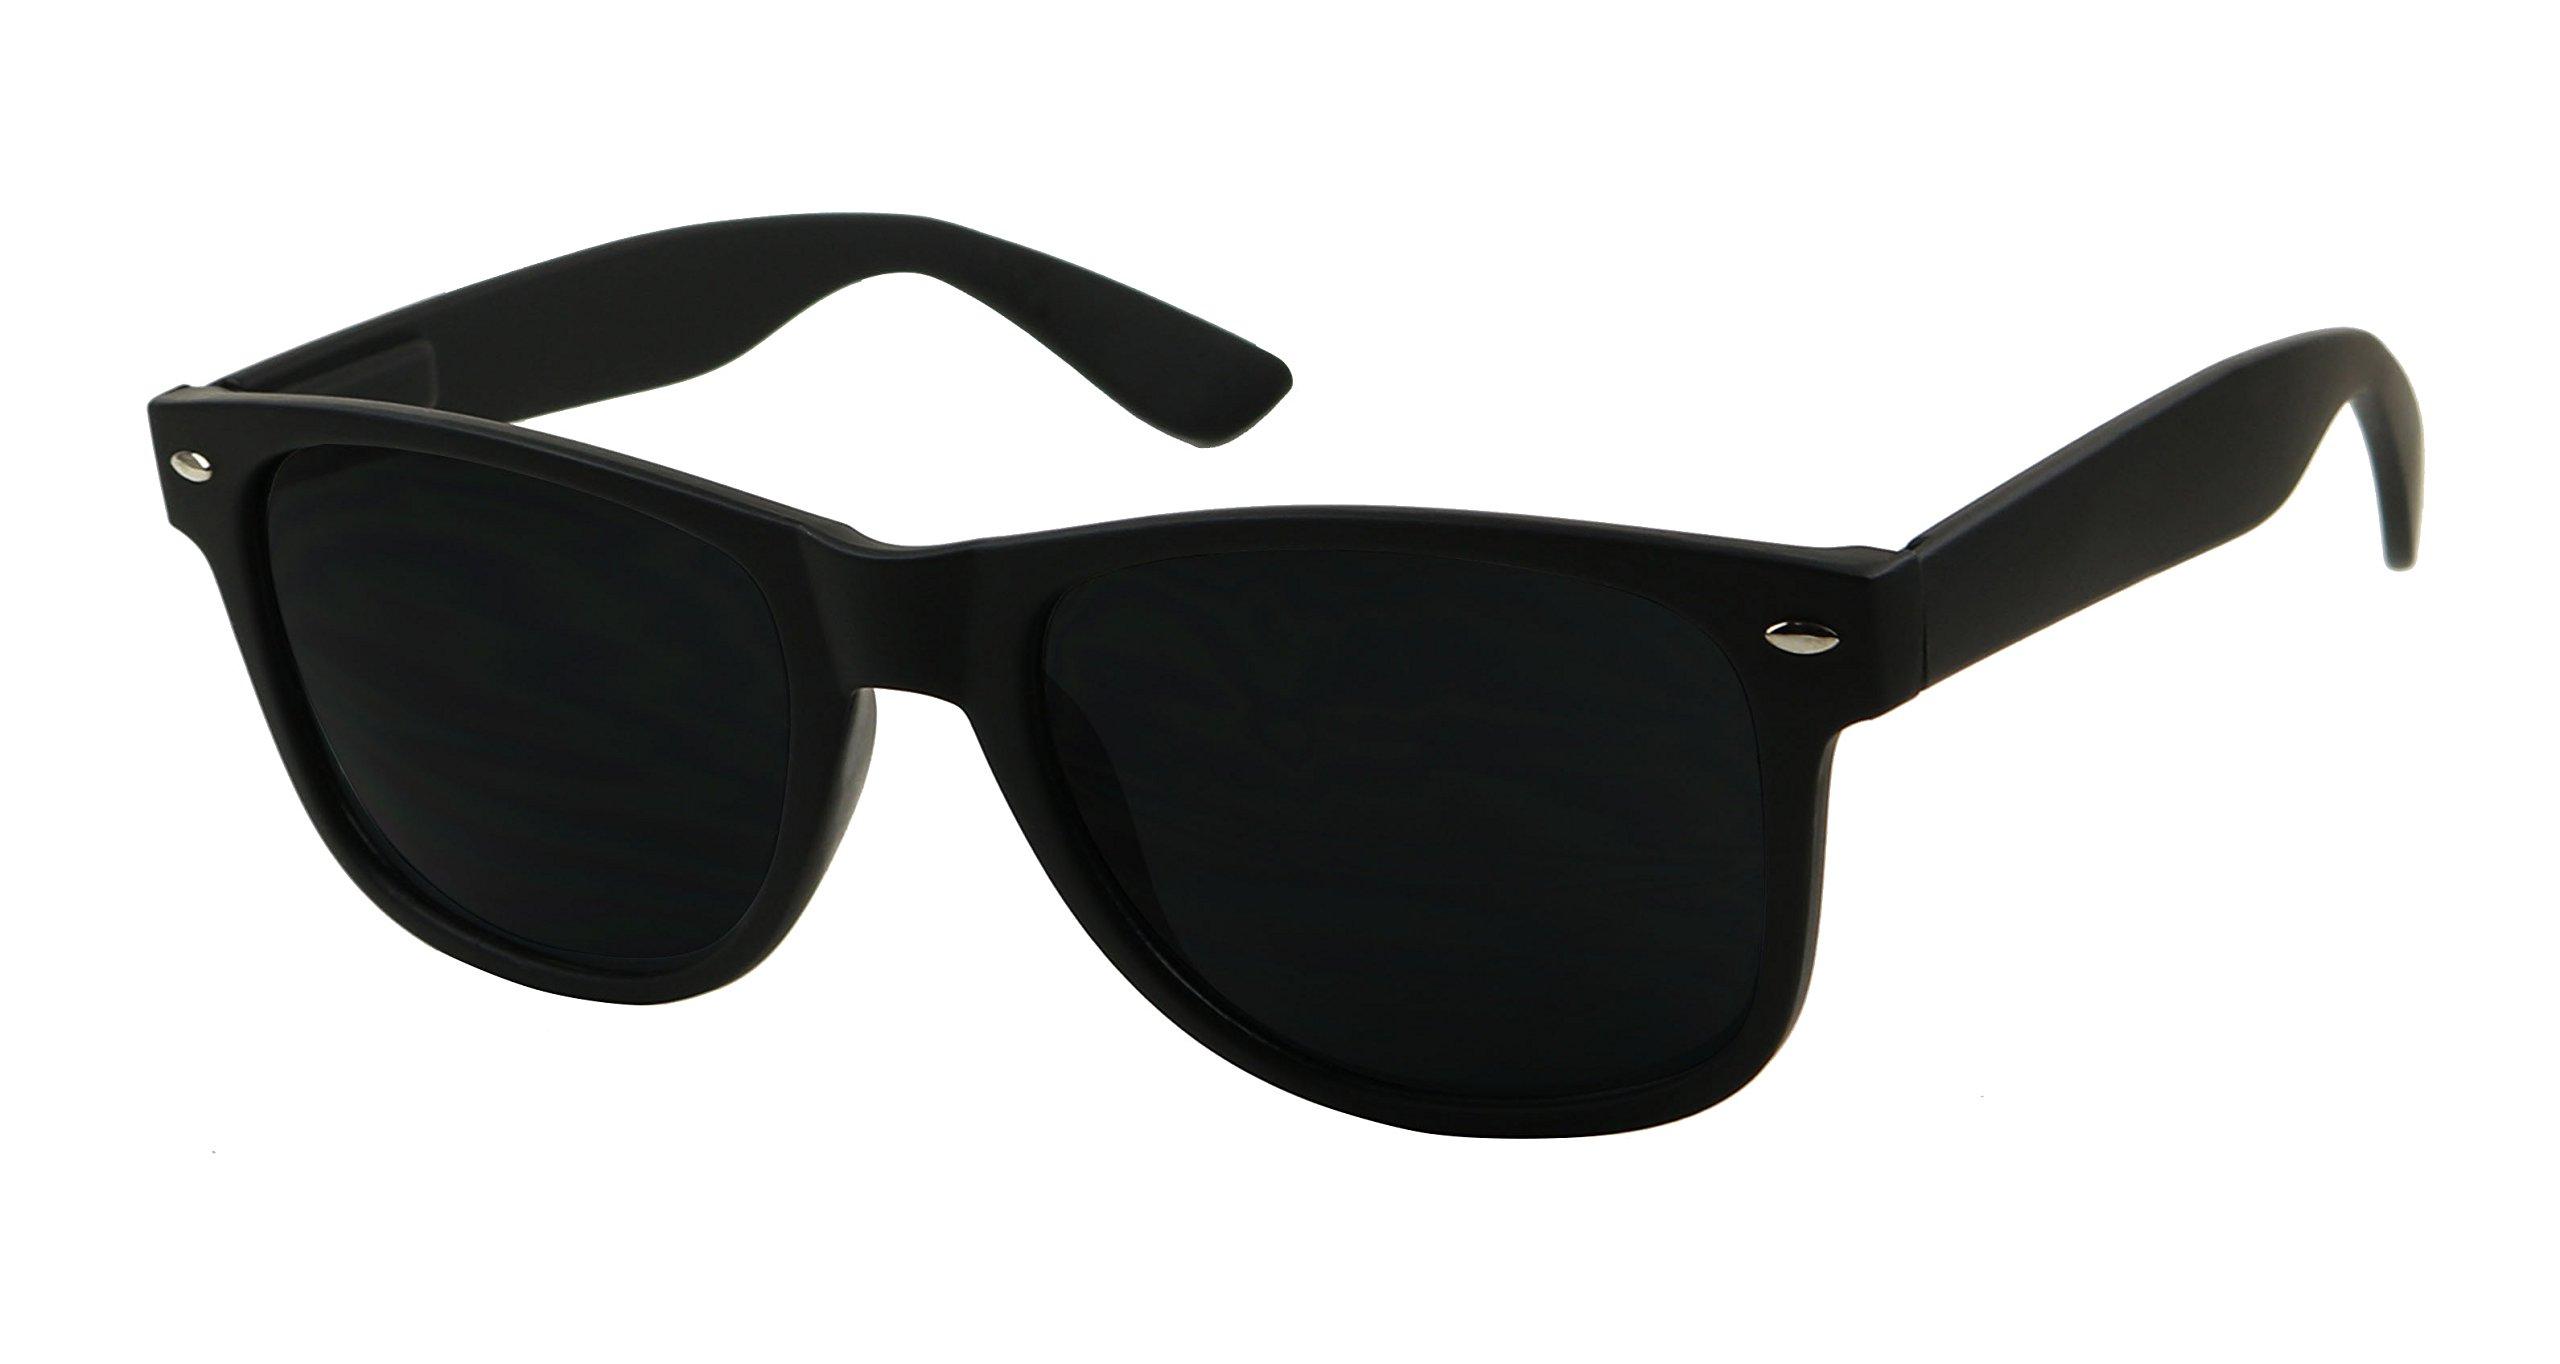 ShadyVEU Extremely Migraine Sensitive Sunglasses